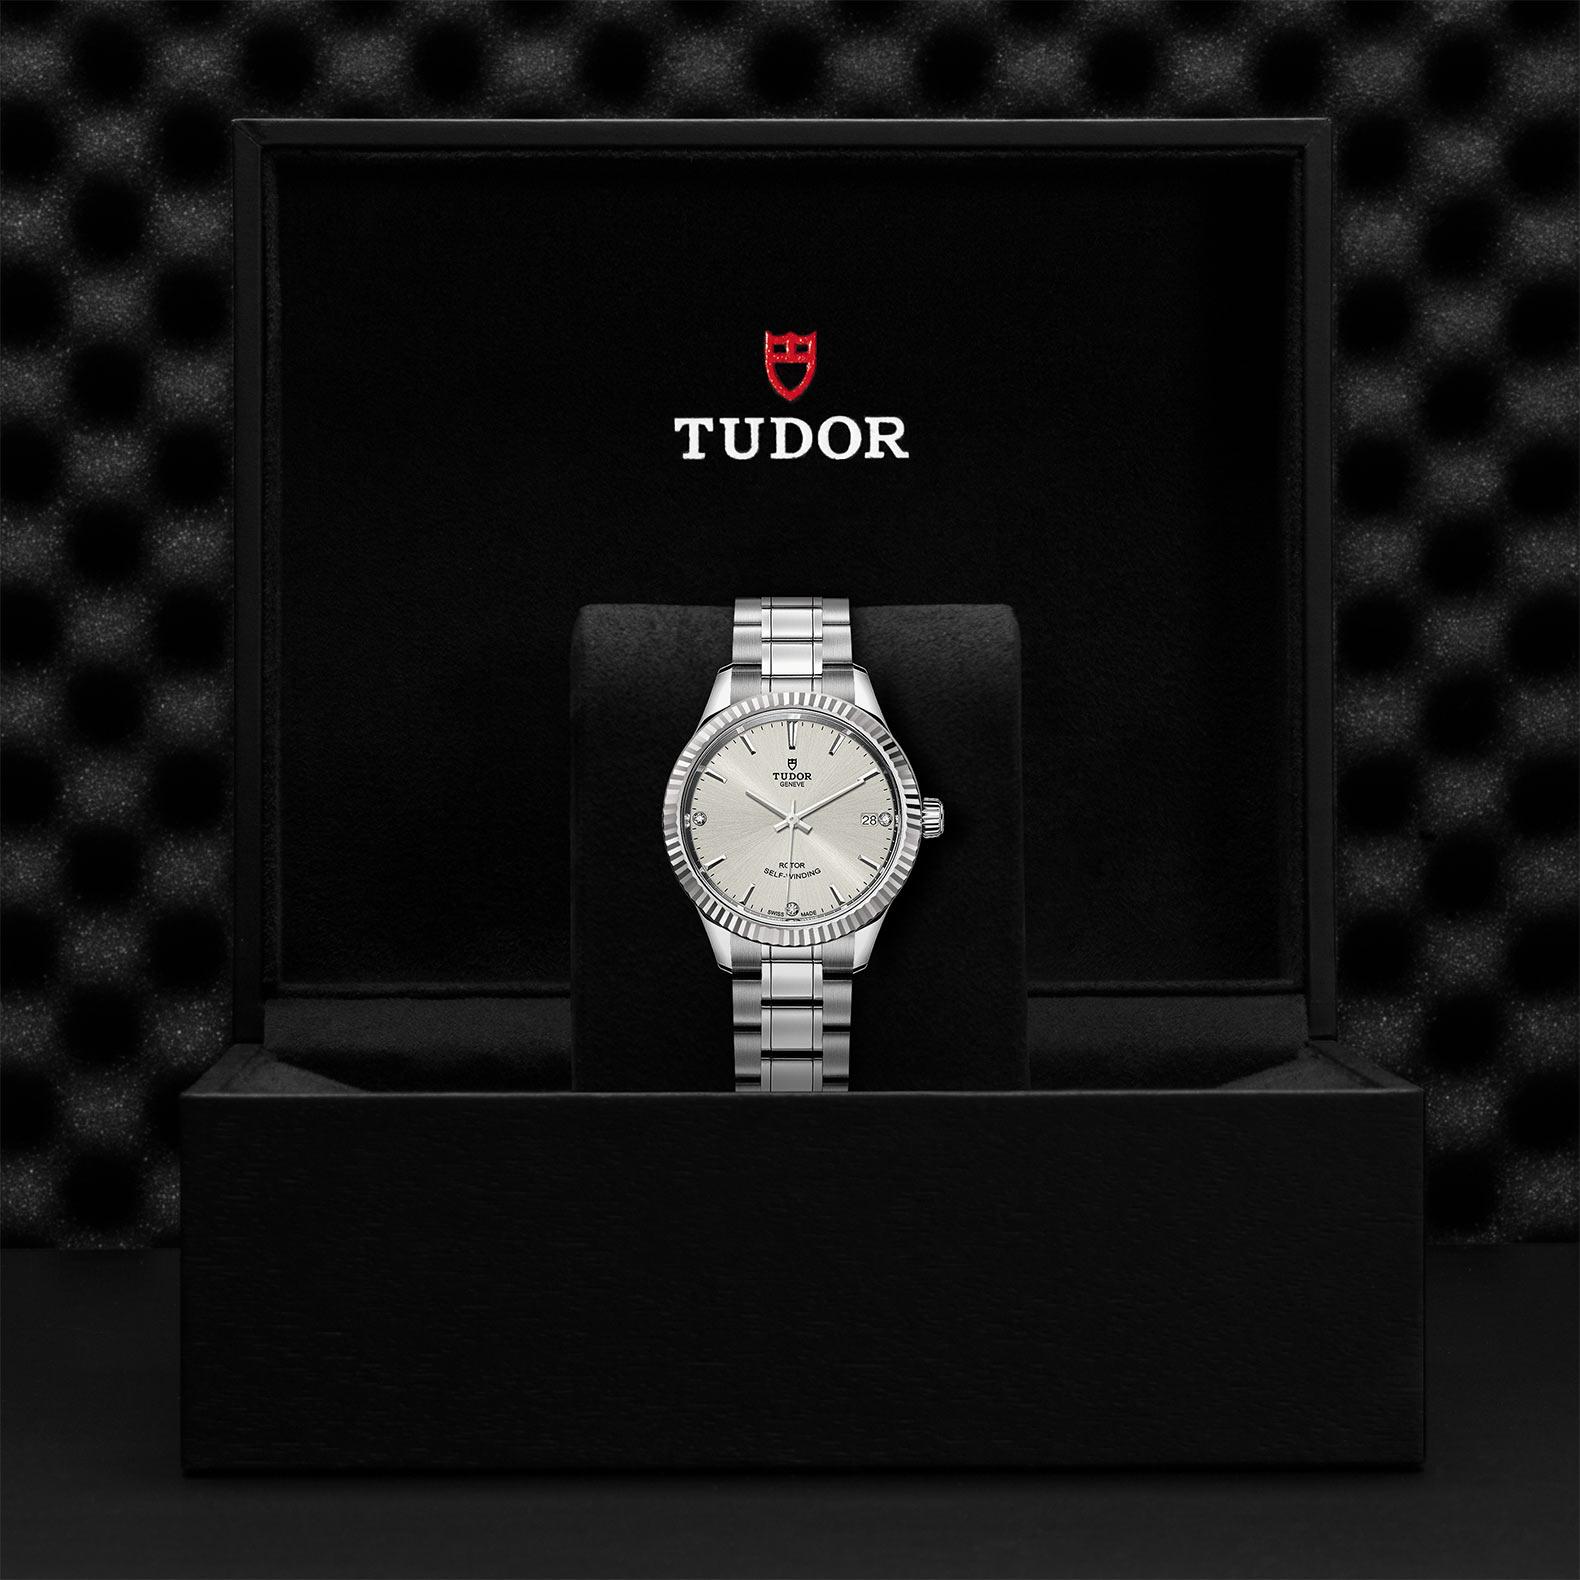 TUDOR Style M12310 0007 Presentationbox